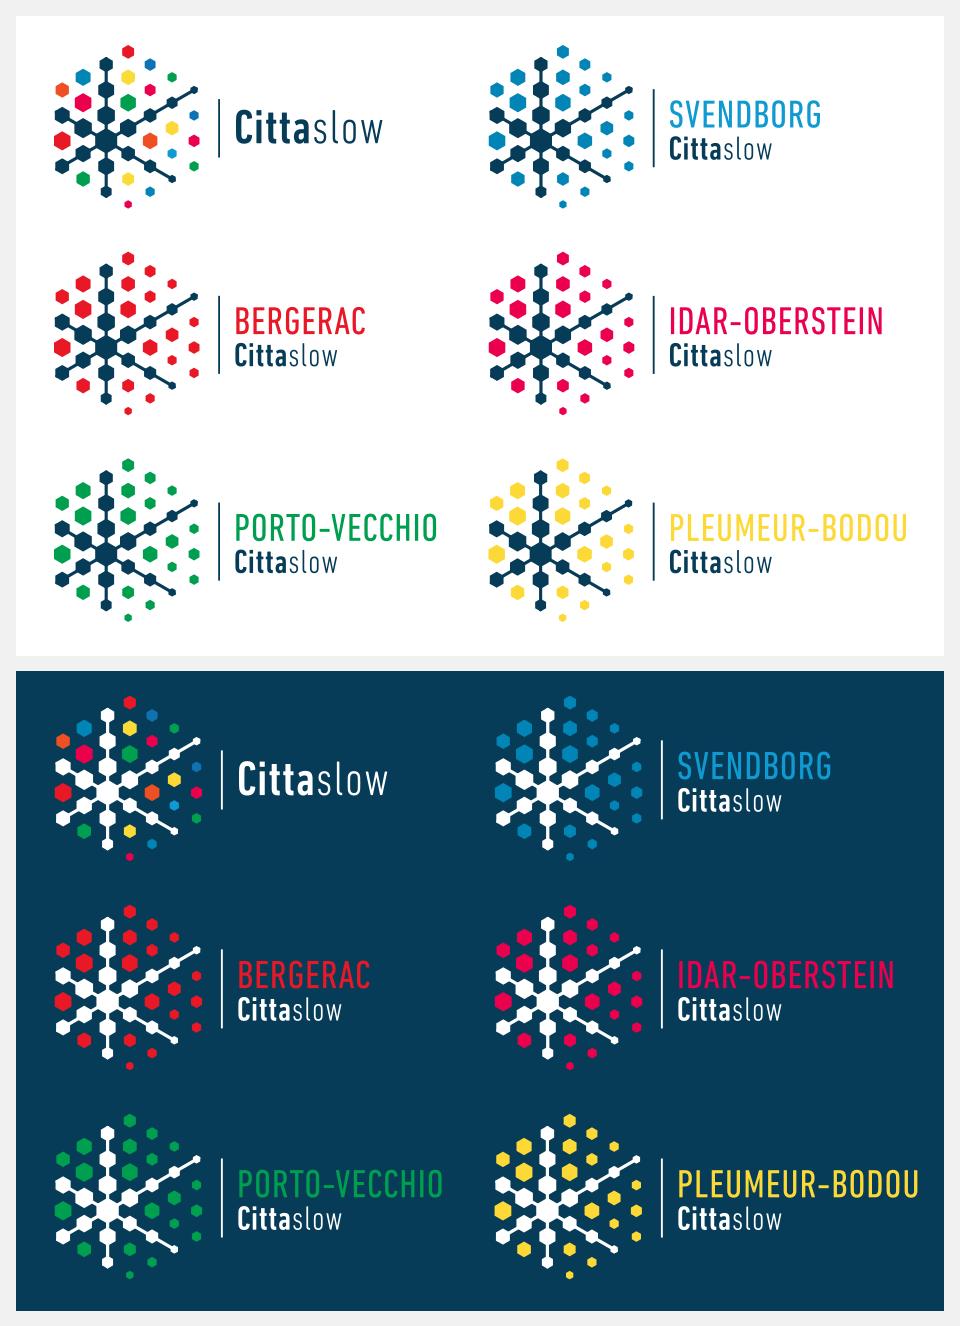 Pierre Besombes - Logo ombrelle et variantes